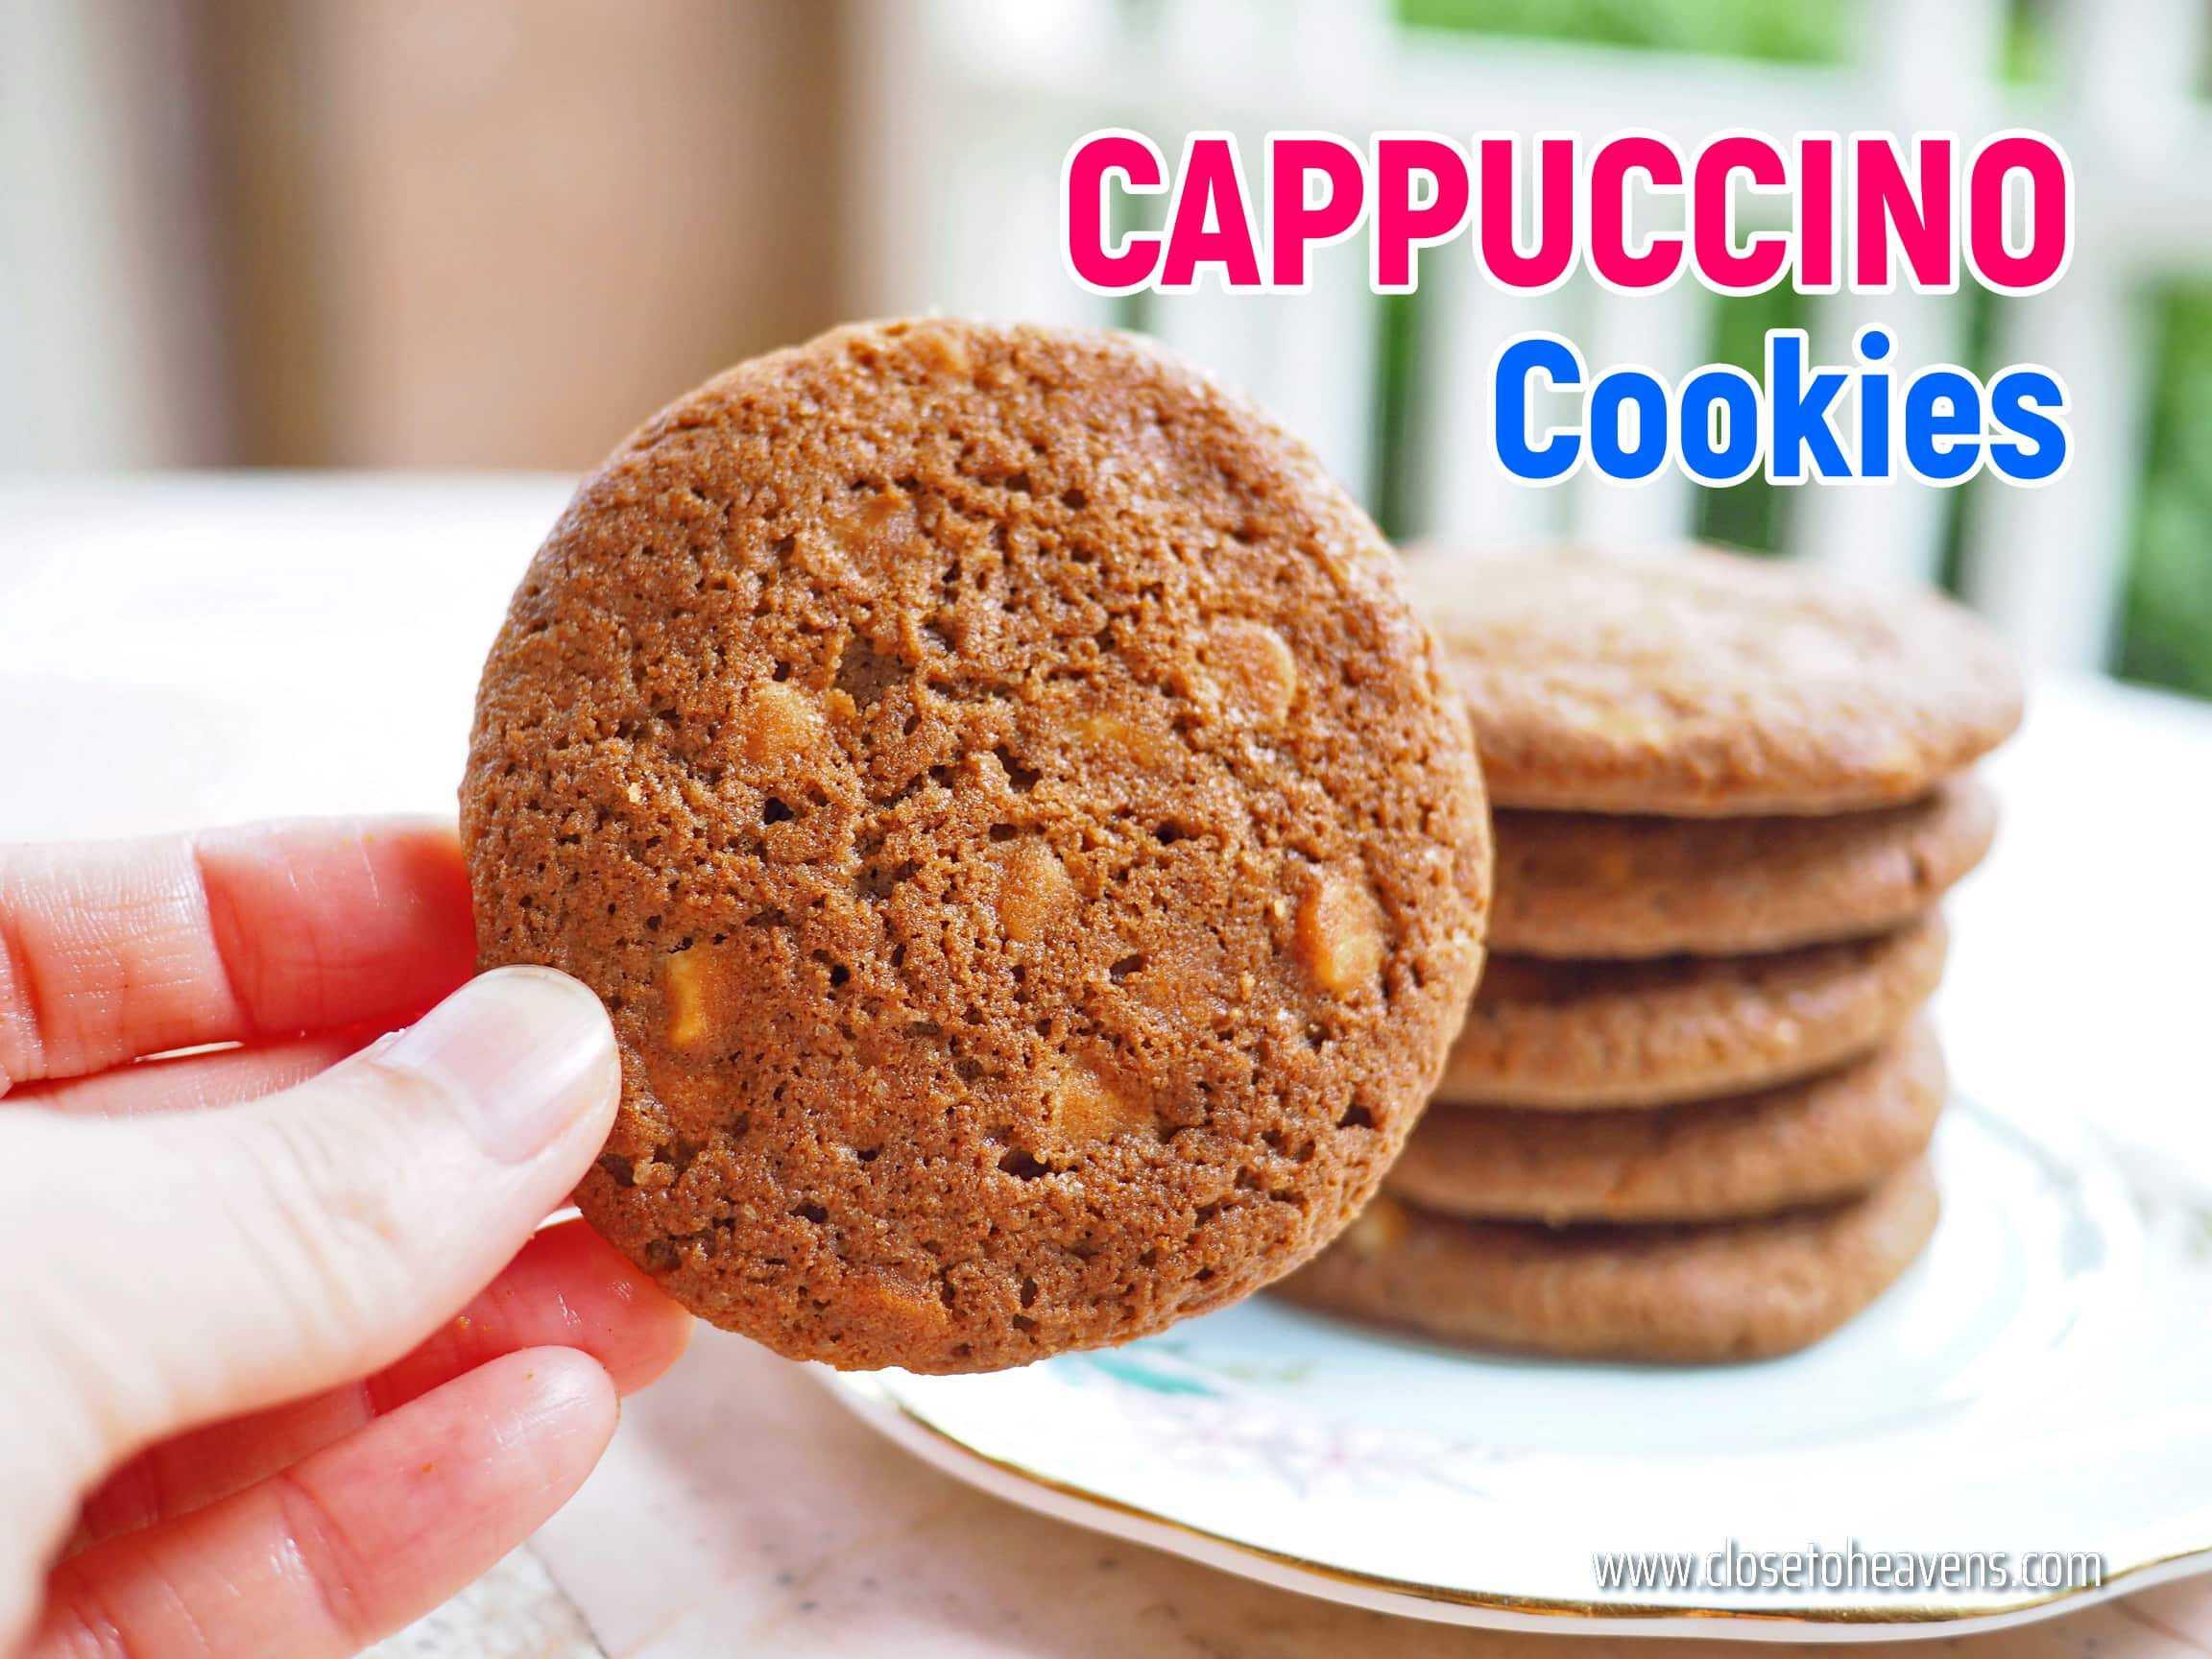 Cappuccino Cookies สูตร คุกกี้กาแฟ คาปูชิโน่